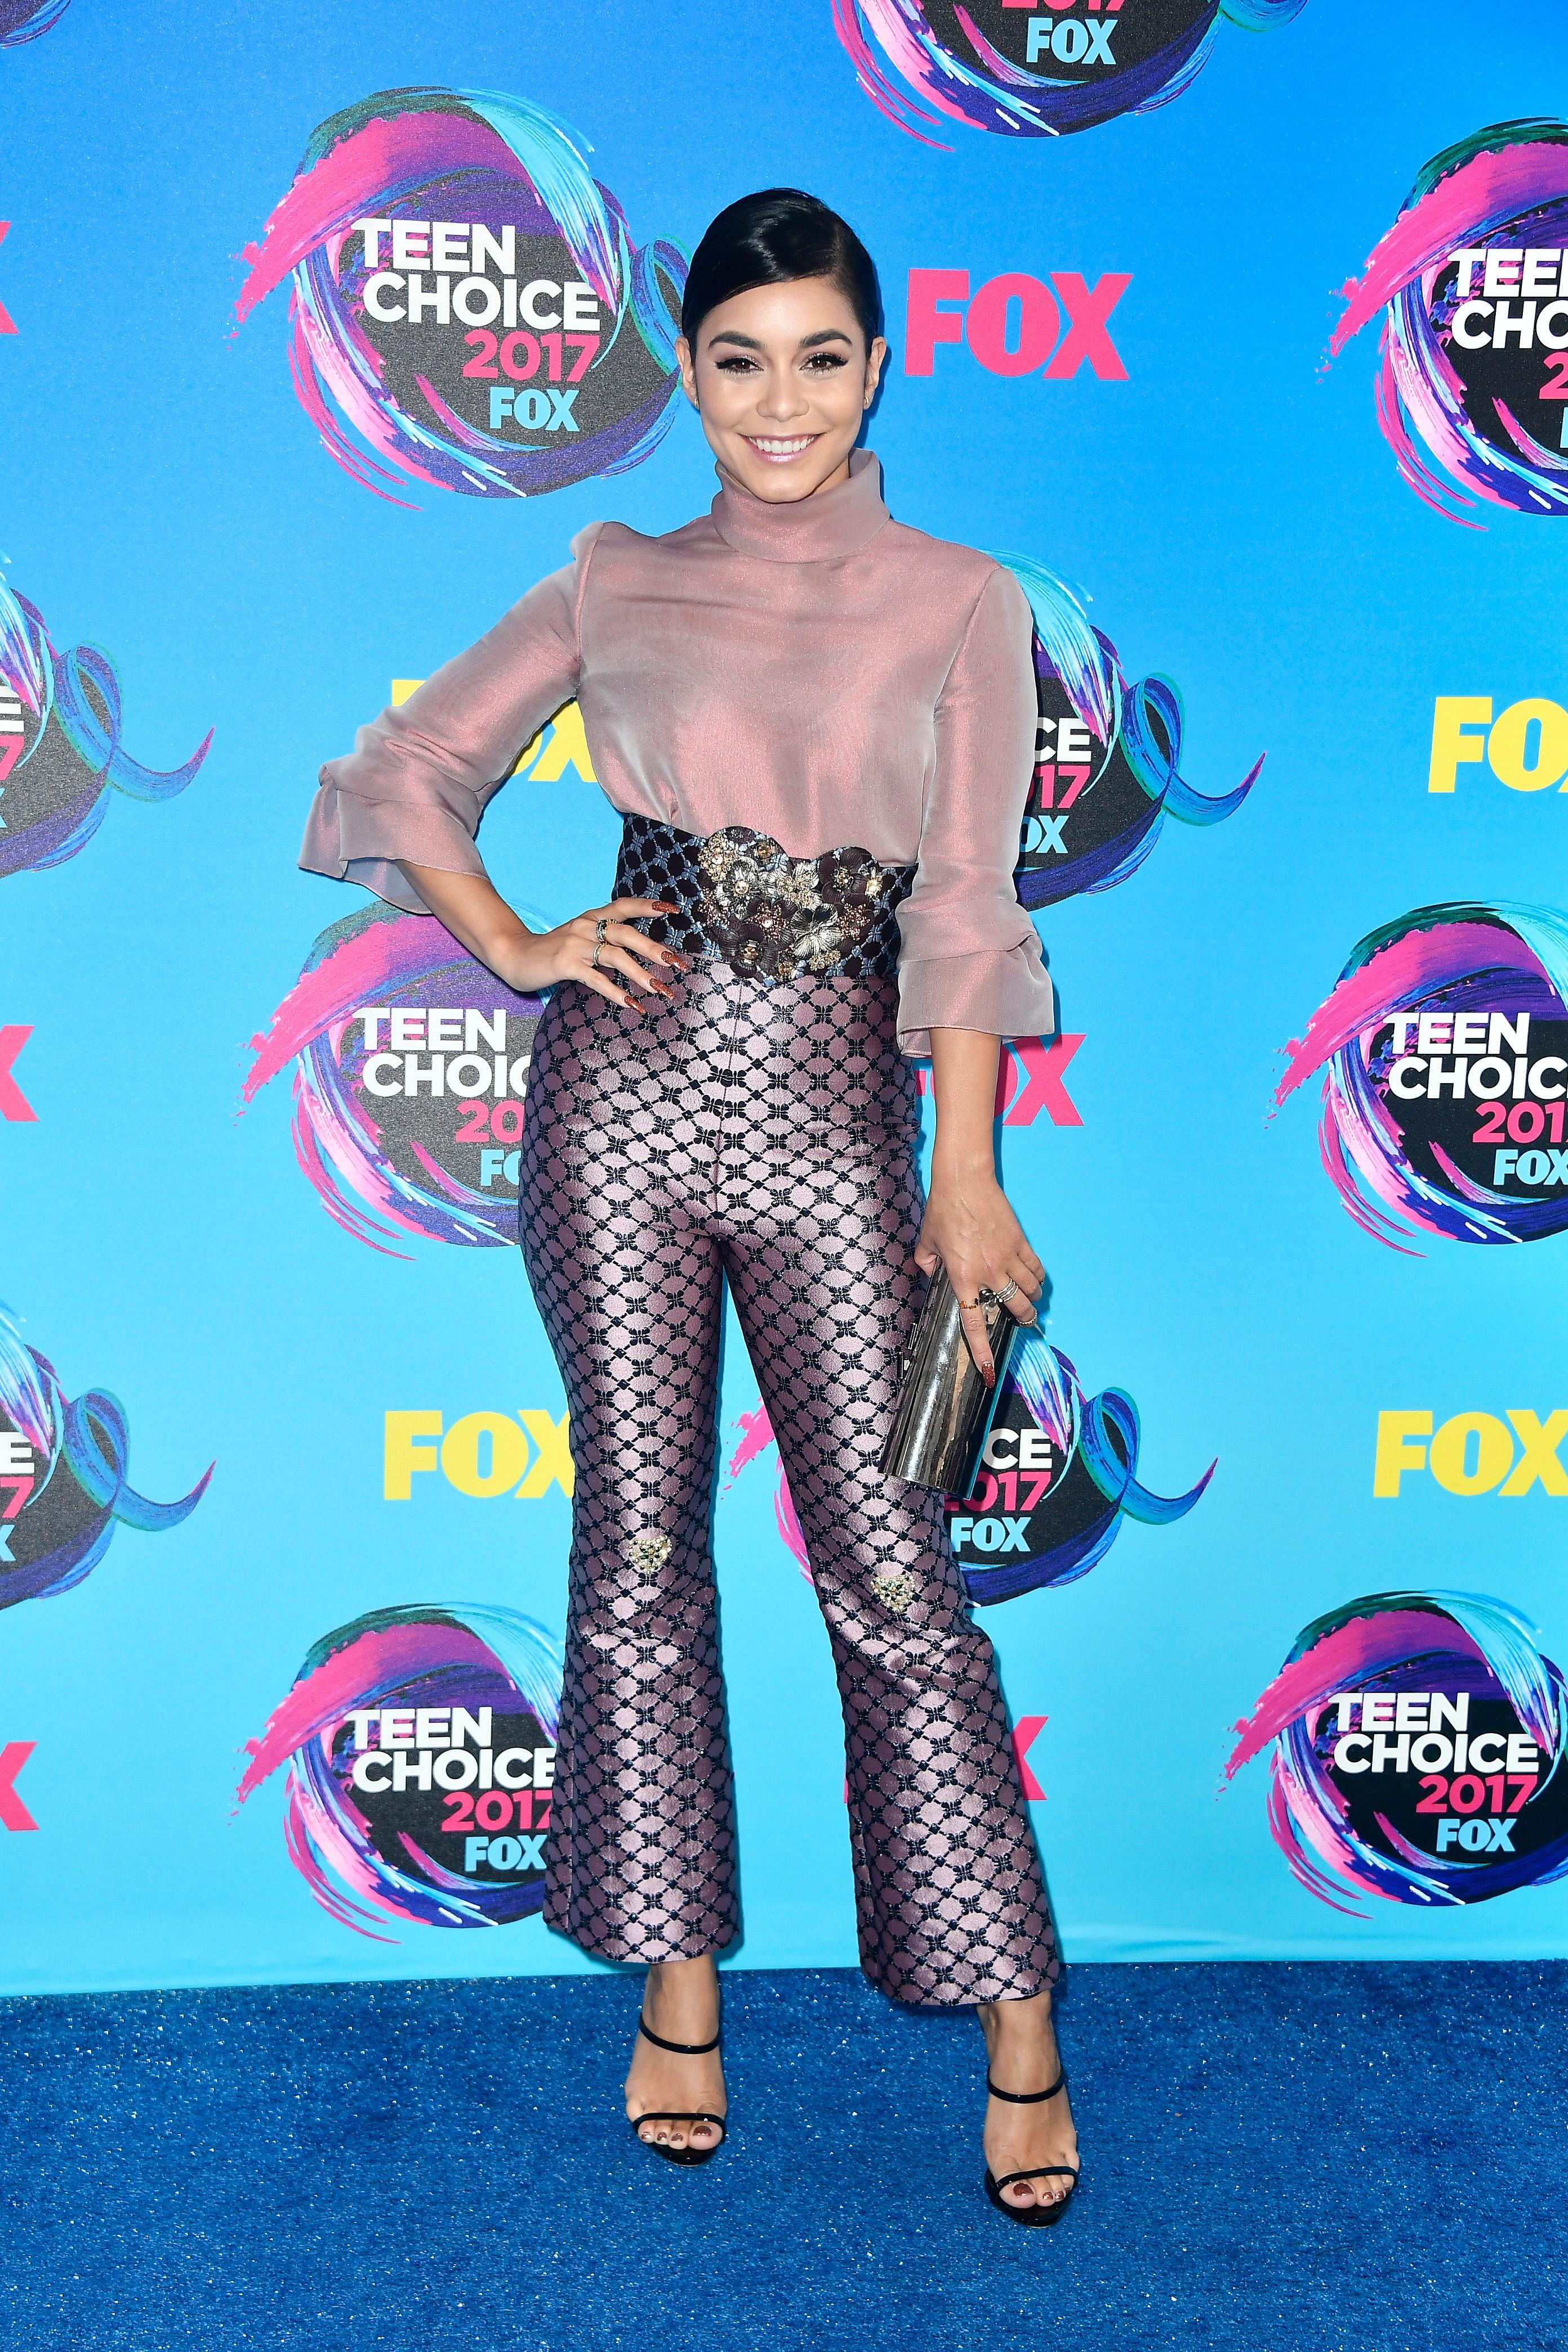 Teen Choice Awards 2017 - Vanessa Hudgens